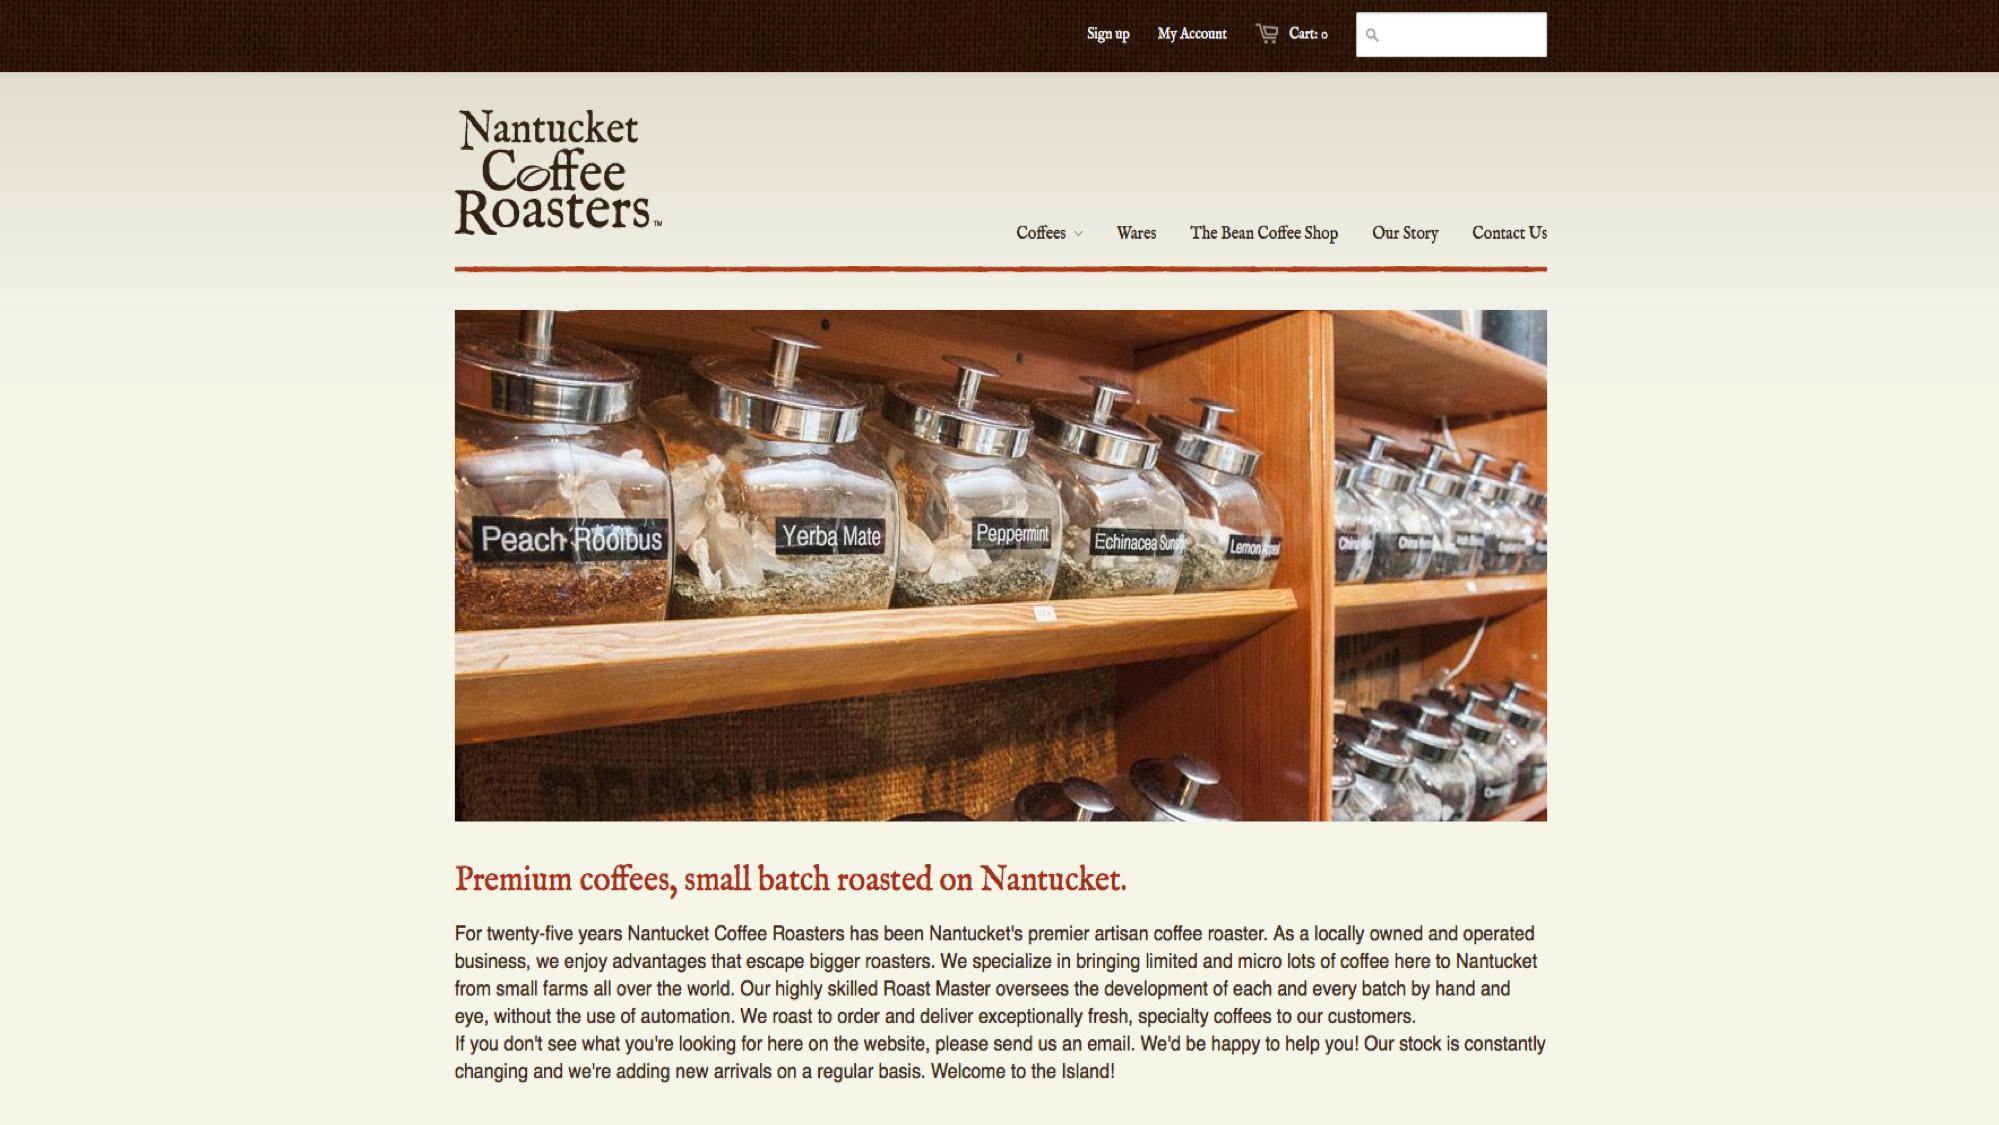 nantucket coffee.png